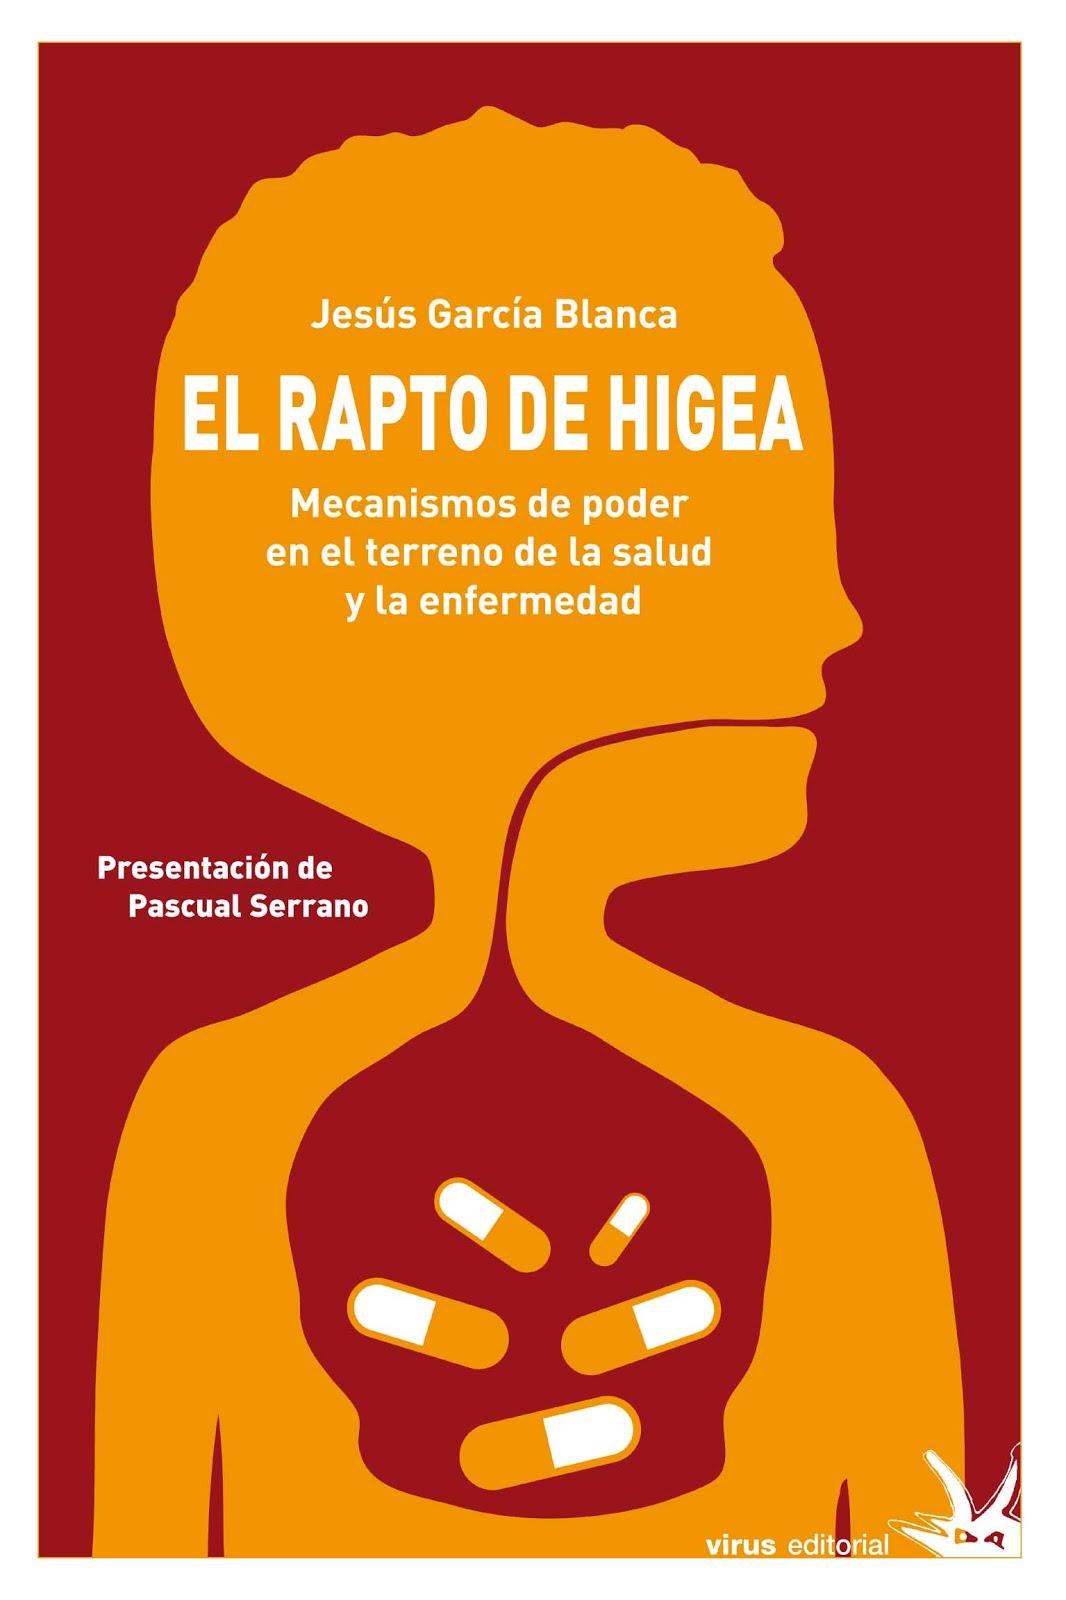 EL RAPTO DE HIGEA (Virus, 2009)